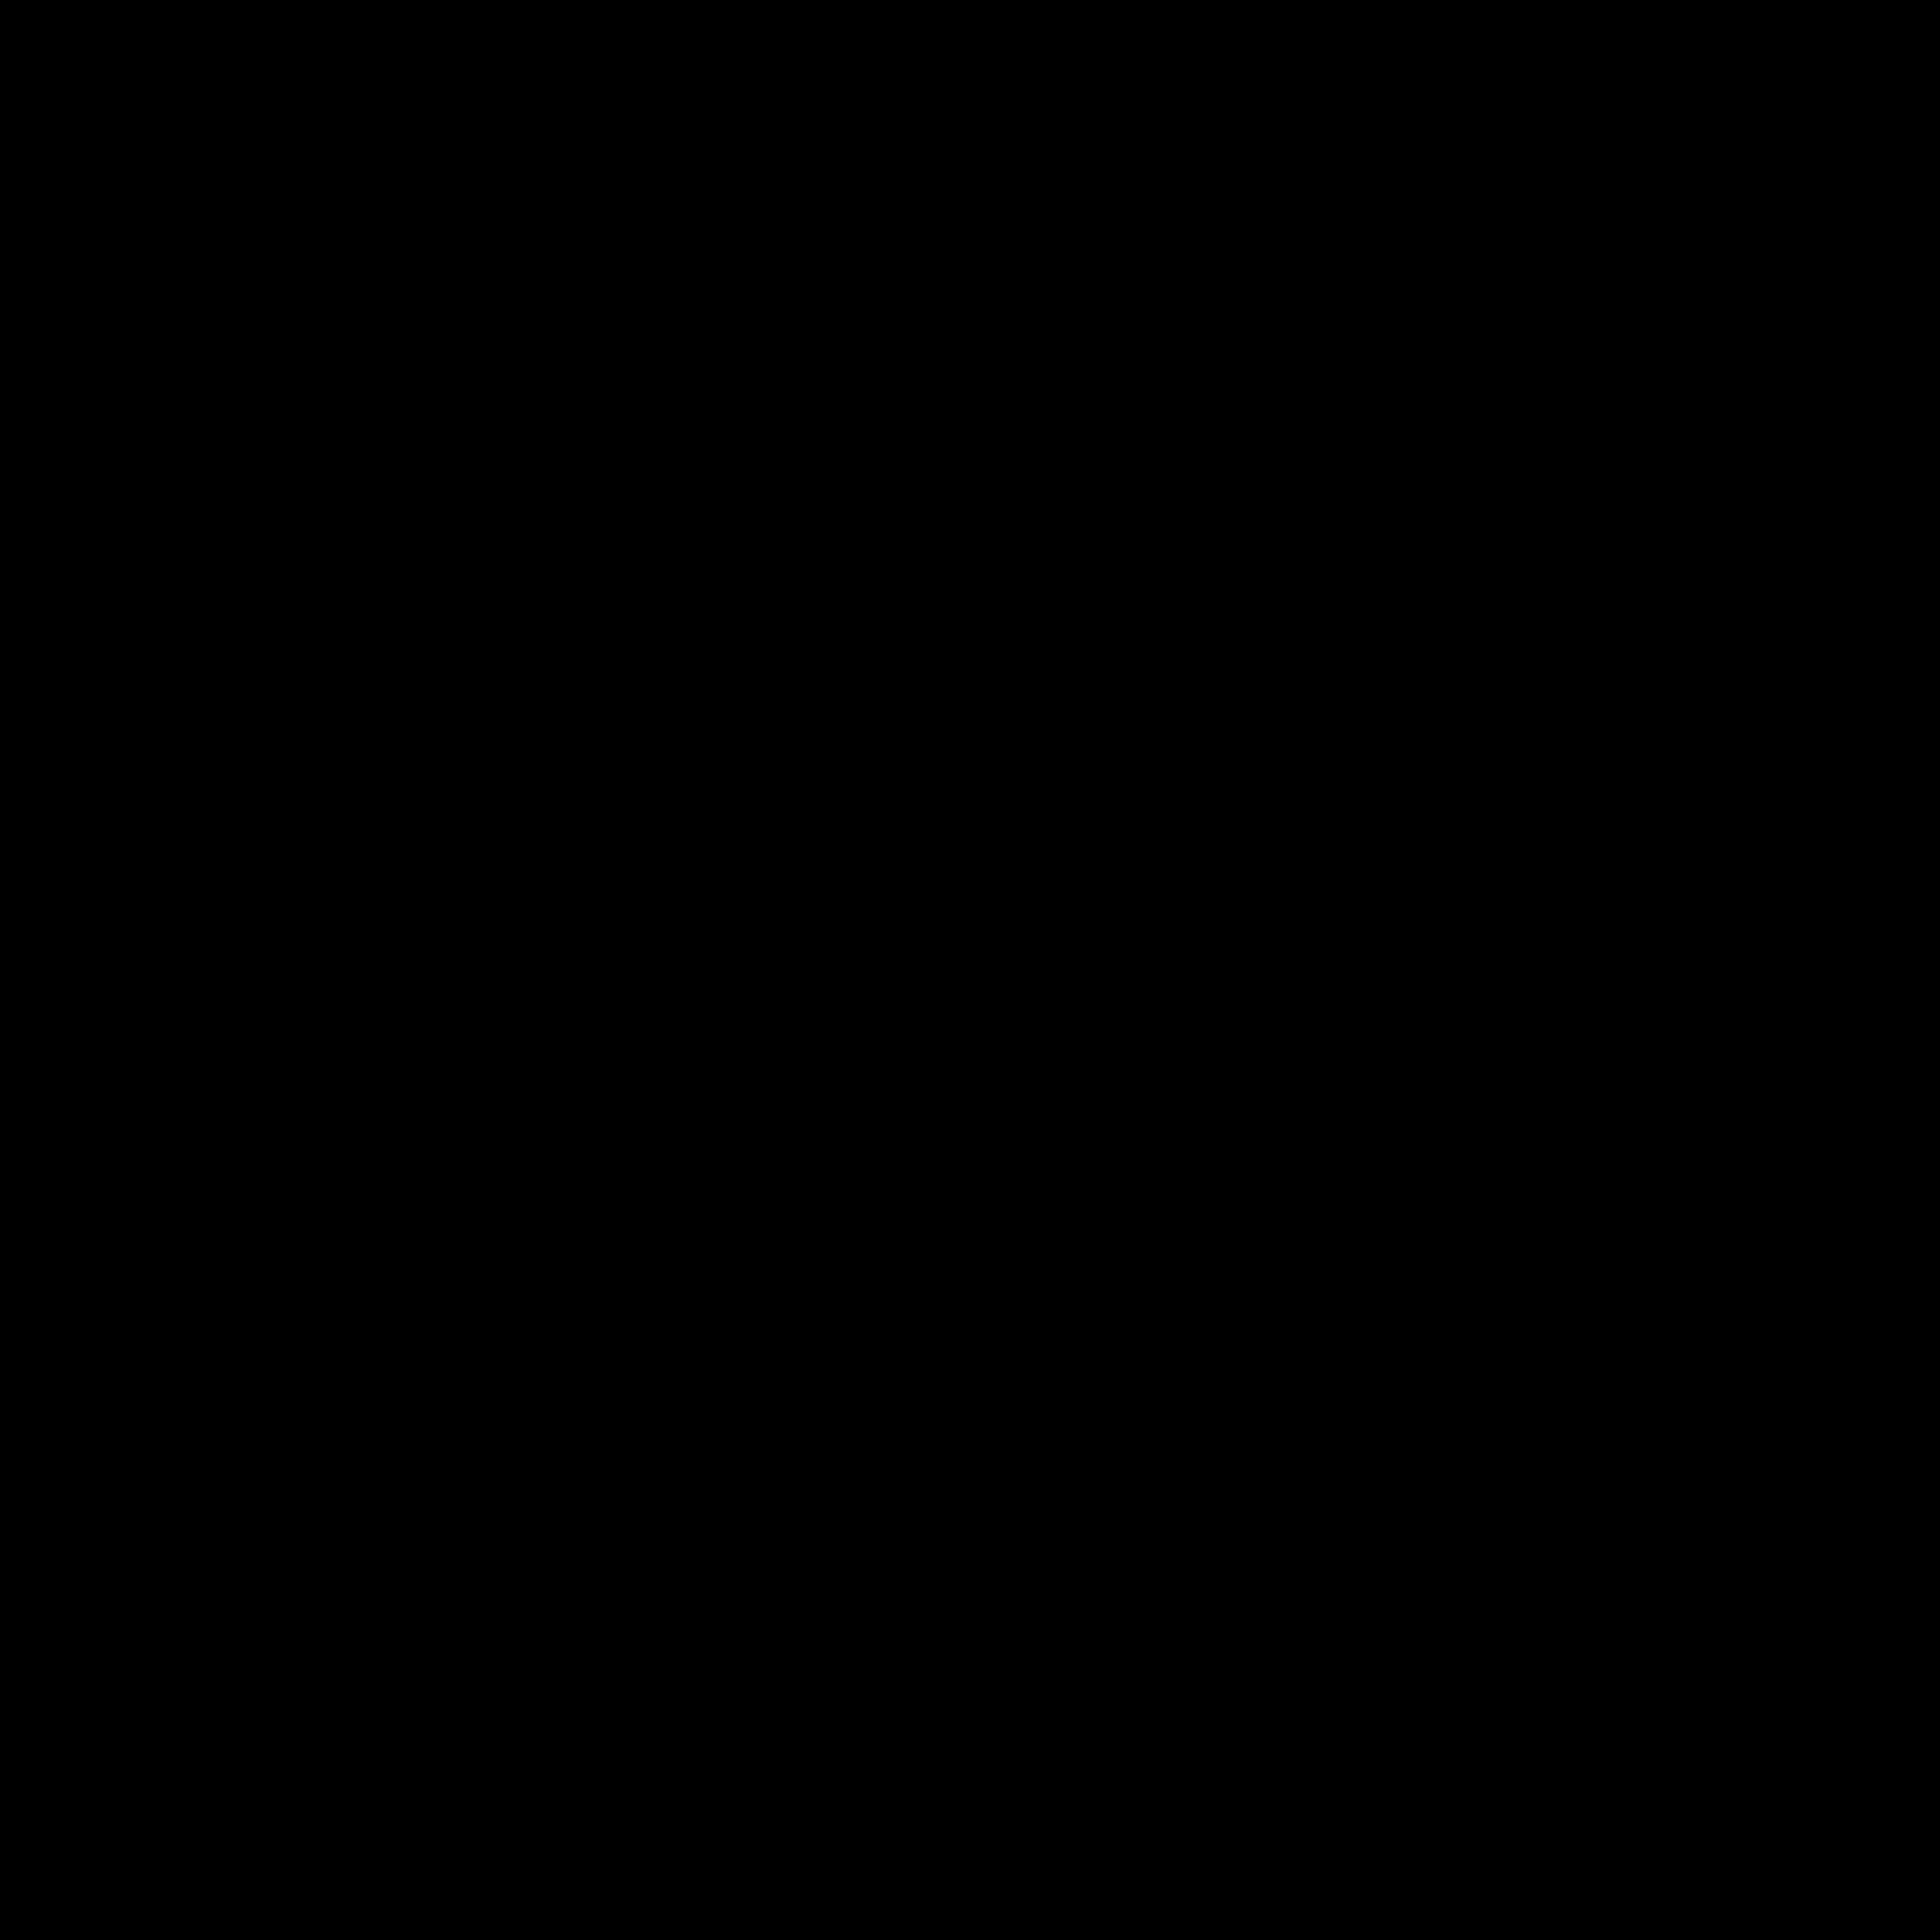 Google themes linkin park - Album Cover Linkin Park Logo Google Keres S